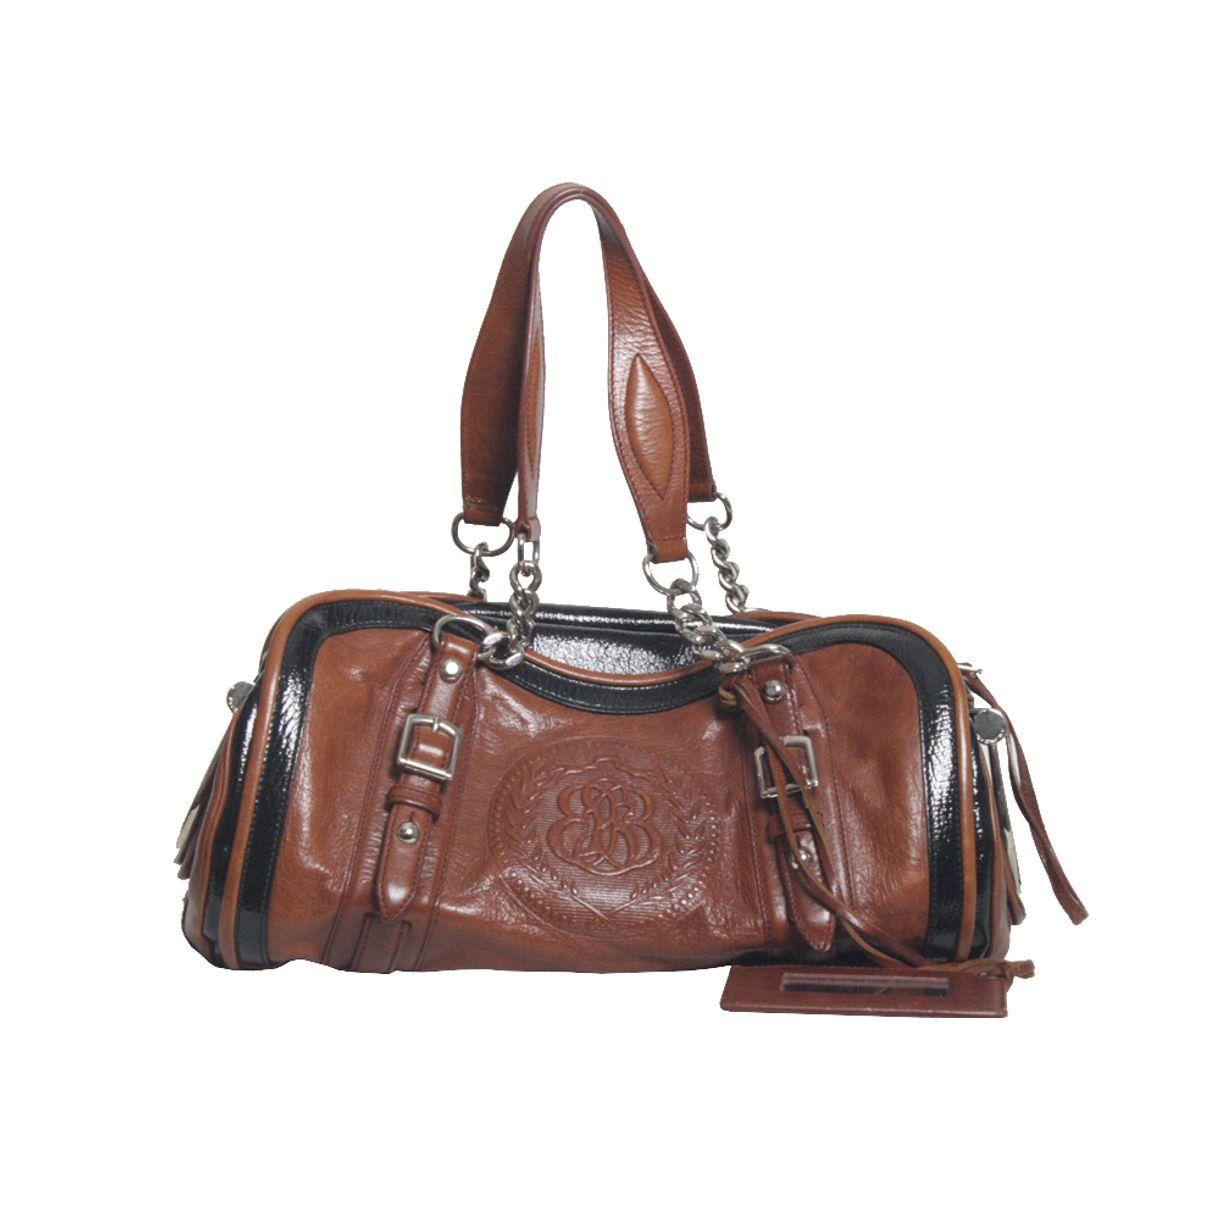 bolsa-balenciaga-marrom-1413-9x5b